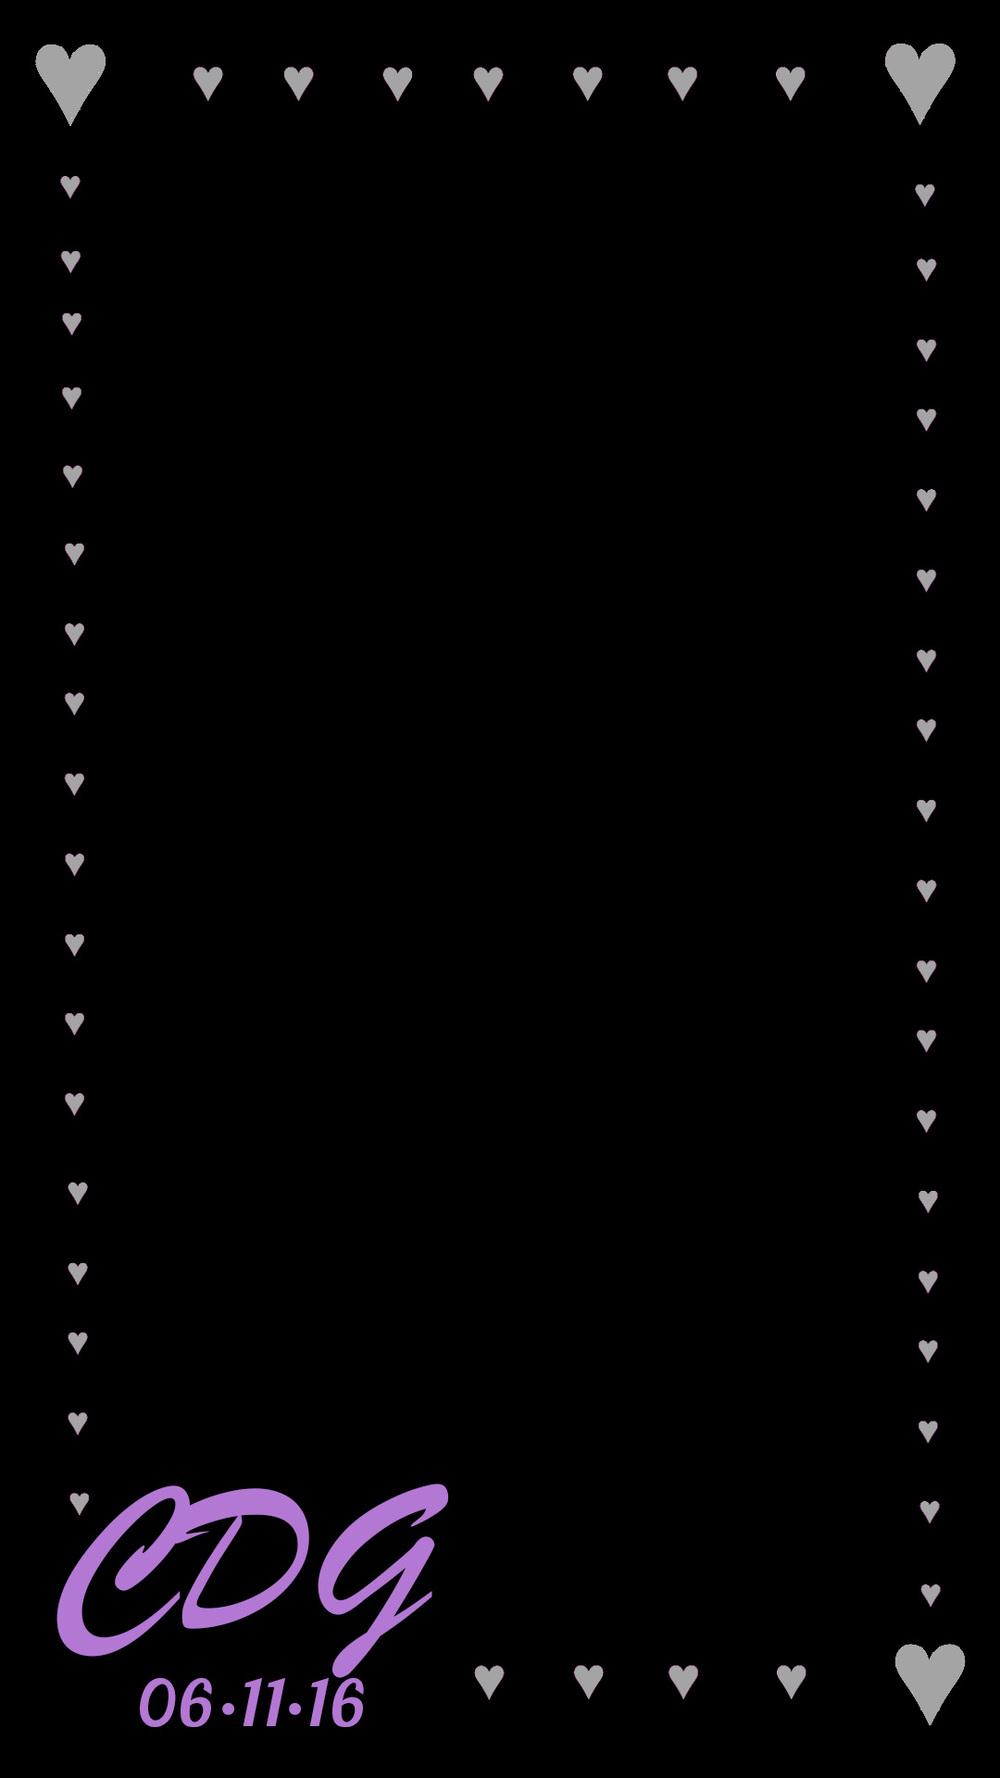 CDG filter_v3.jpg